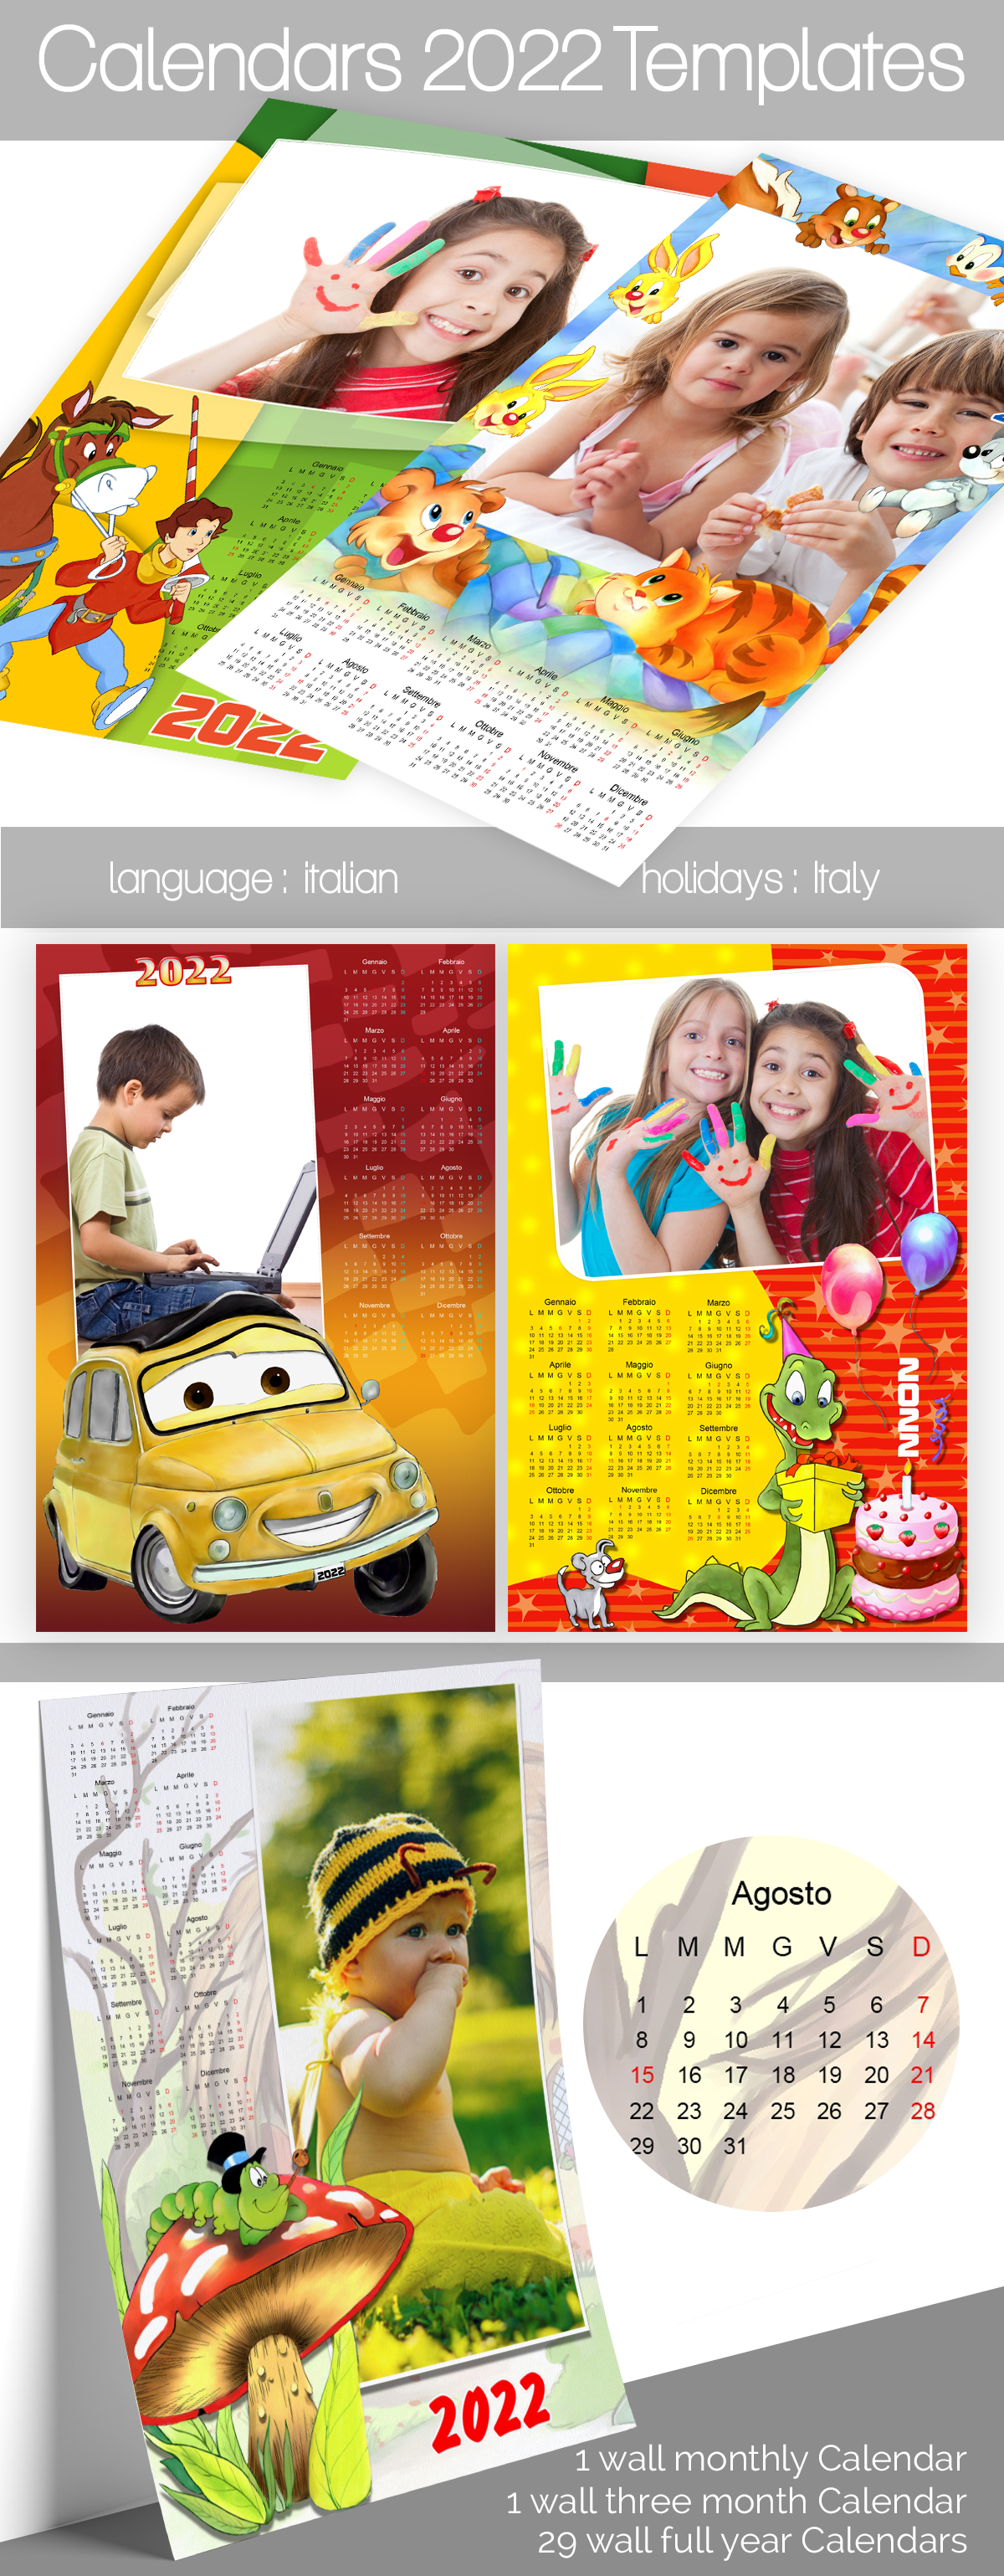 Calendar 2022 Templates